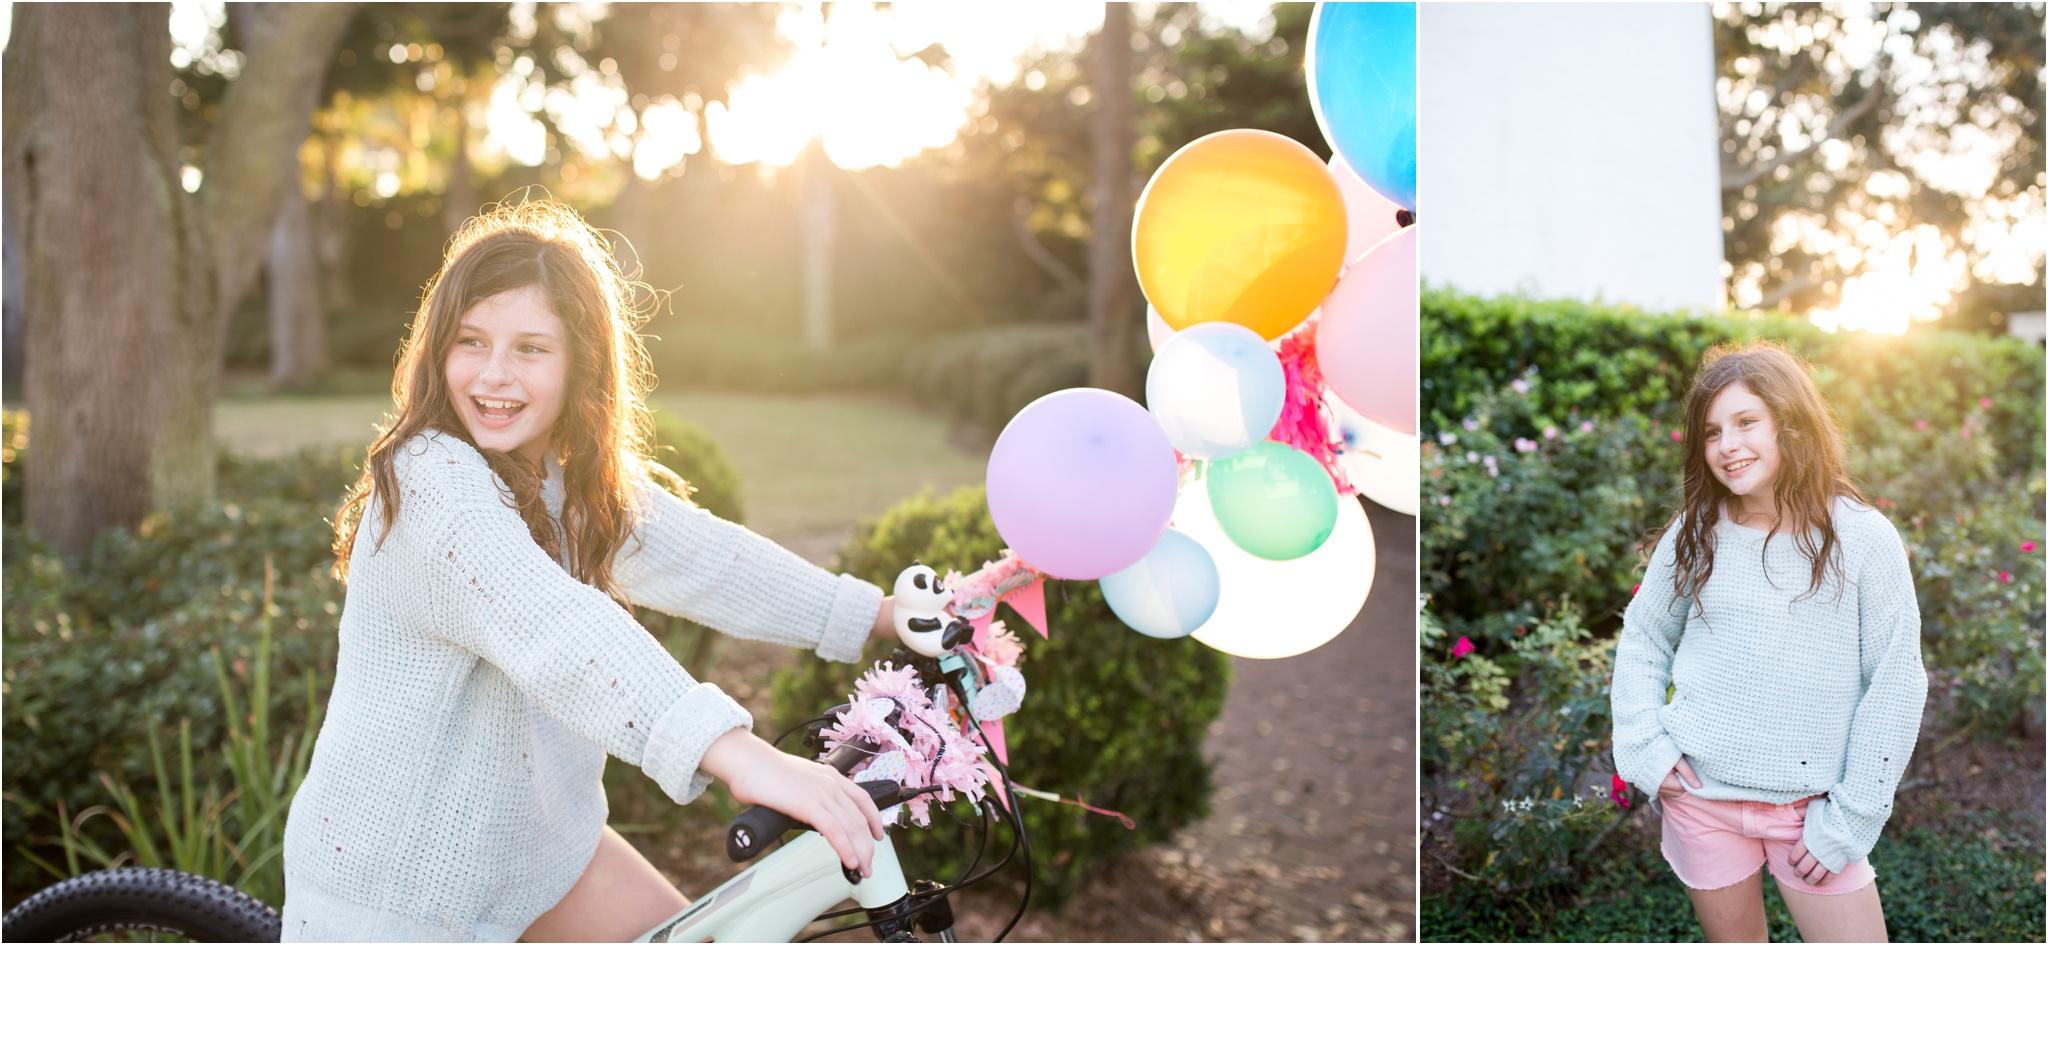 Rainey_Gregg_Photography_St._Simons_Island_Georgia_California_Wedding_Portrait_Photography_1386.jpg